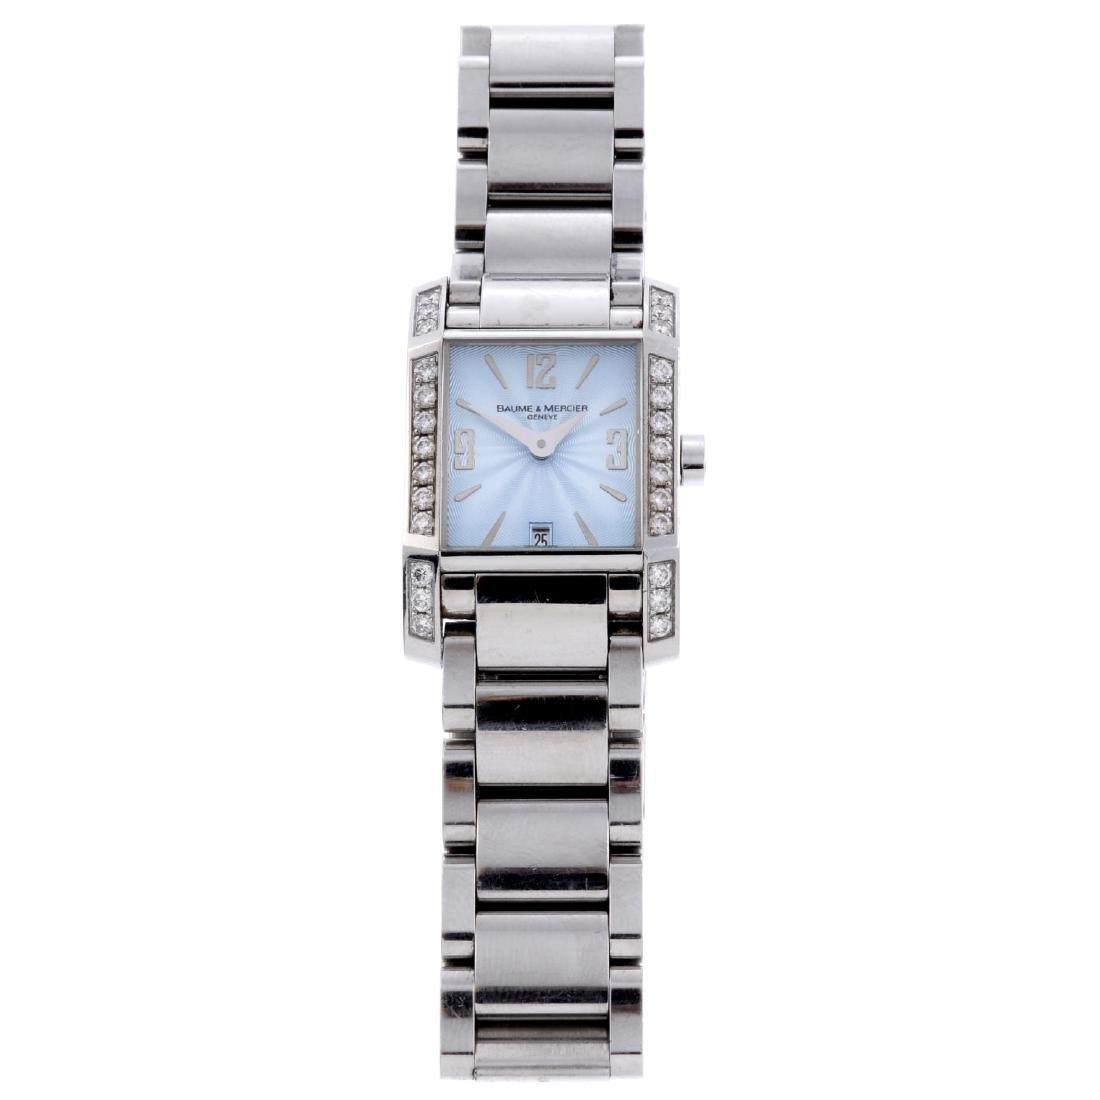 BAUME & MERCIER - a lady's Hampton bracelet watch.